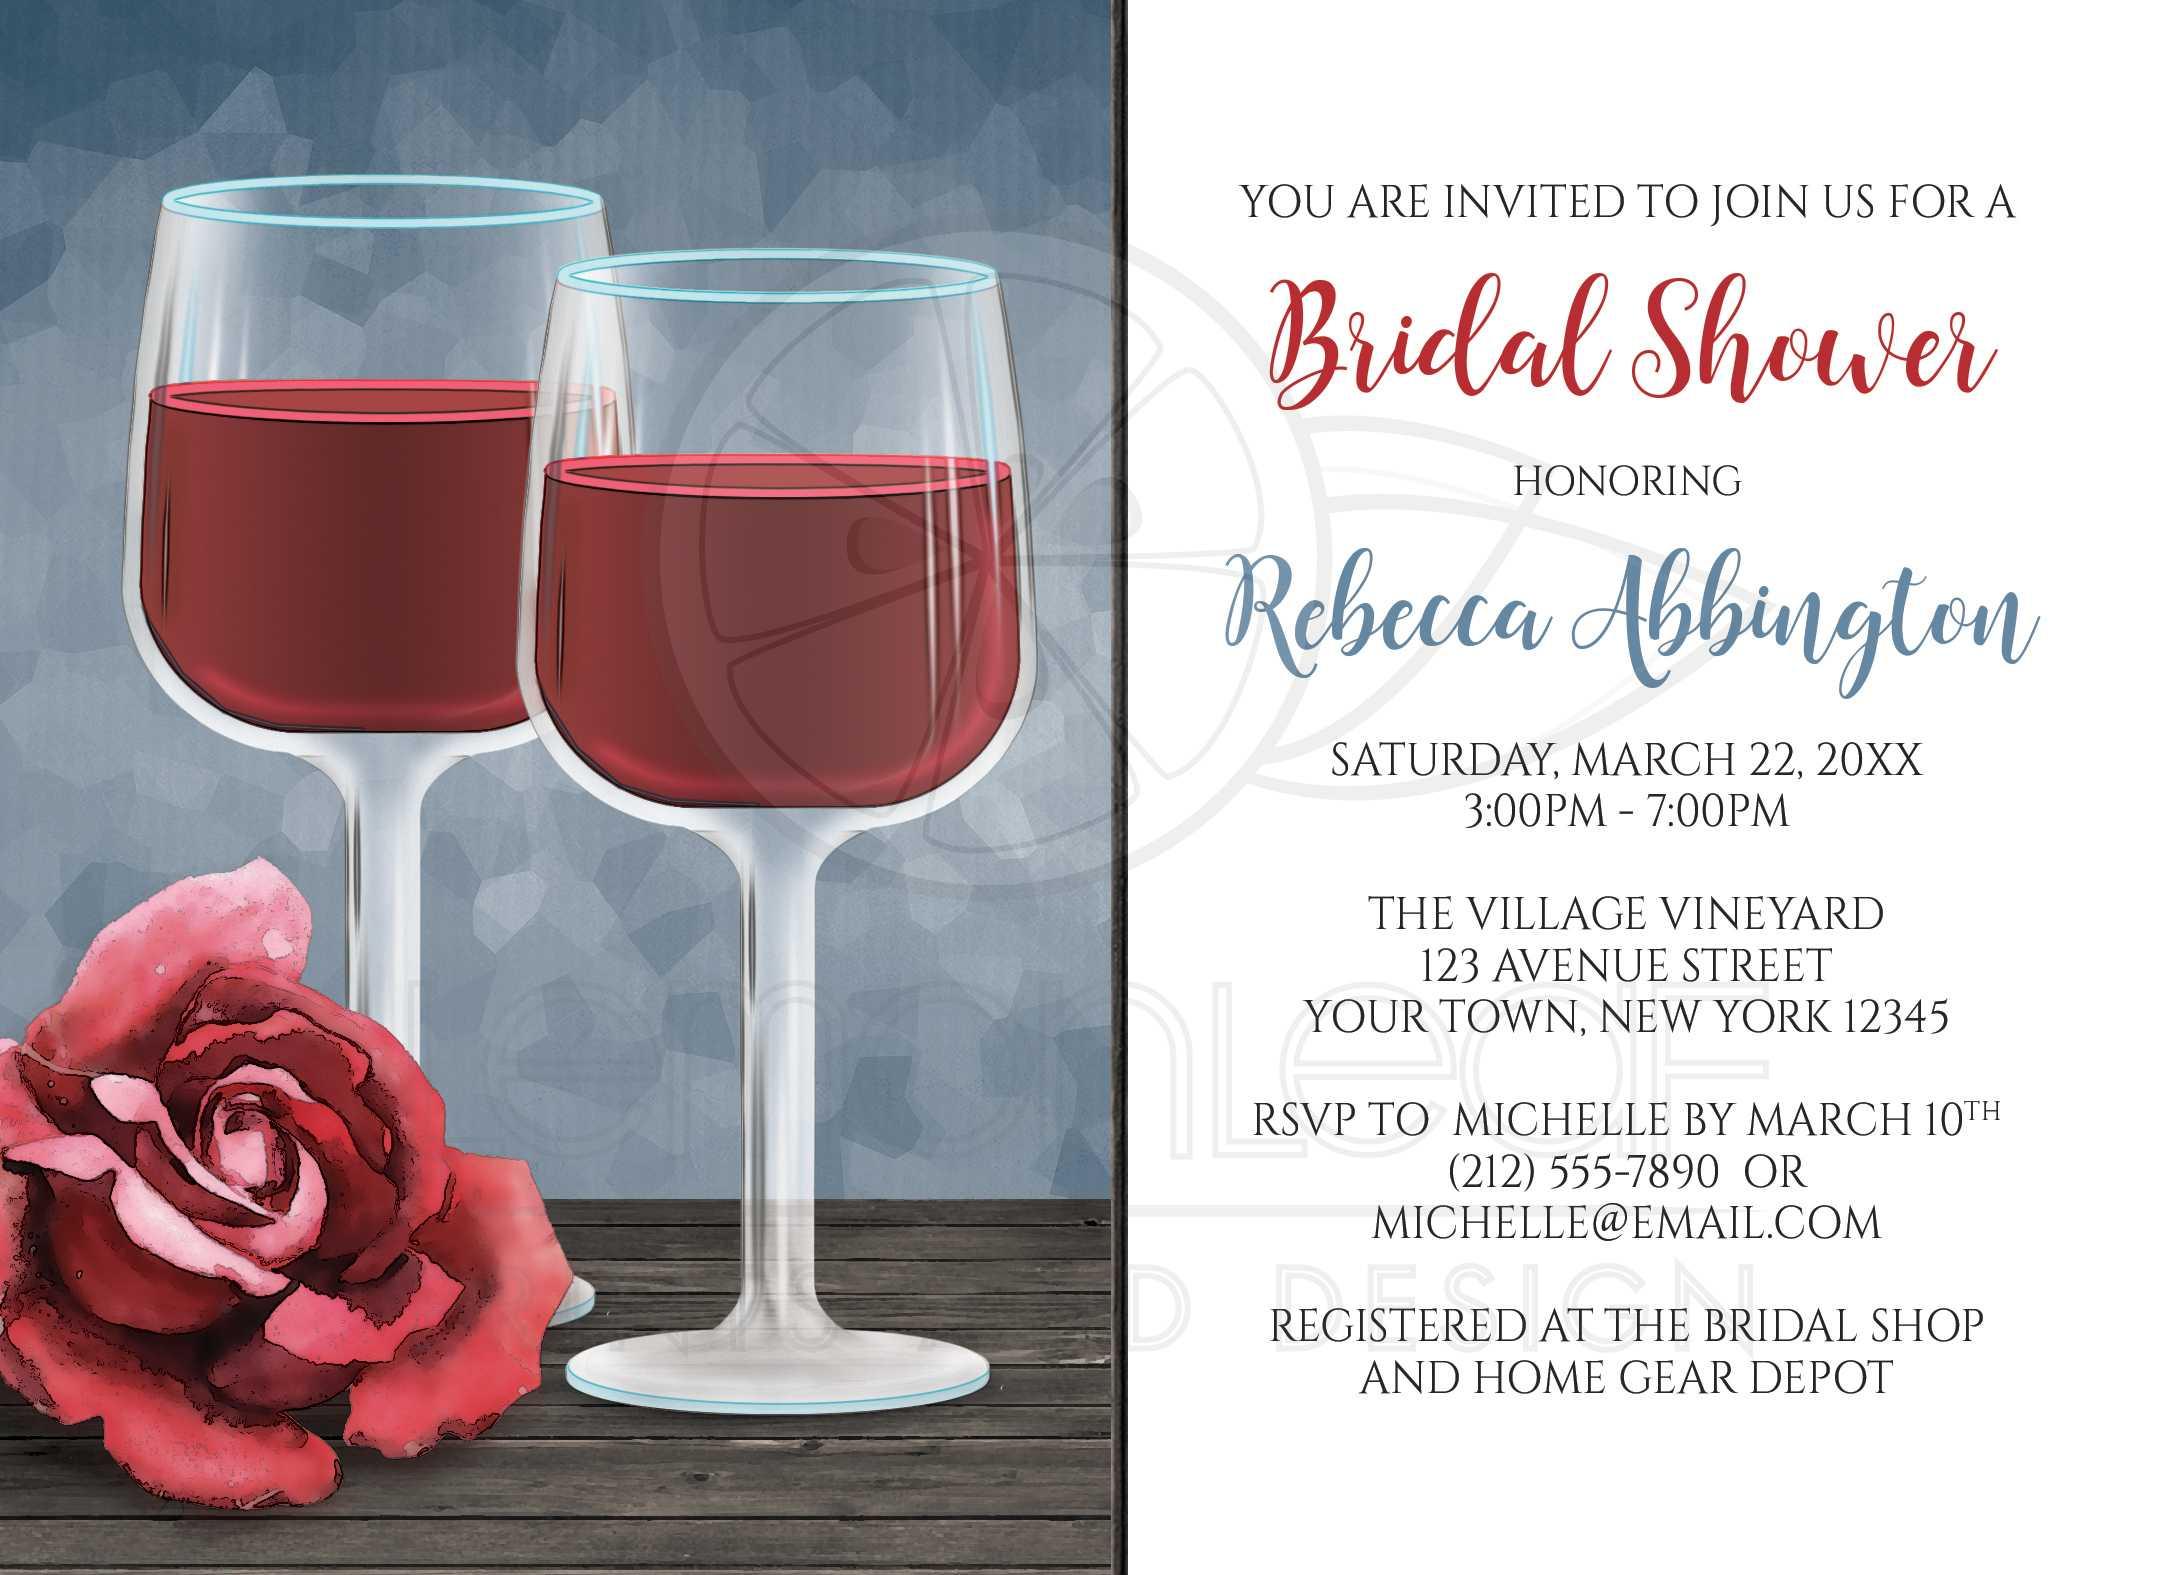 Bridal Shower Invitations - Red Wine Glasses Floral Rose